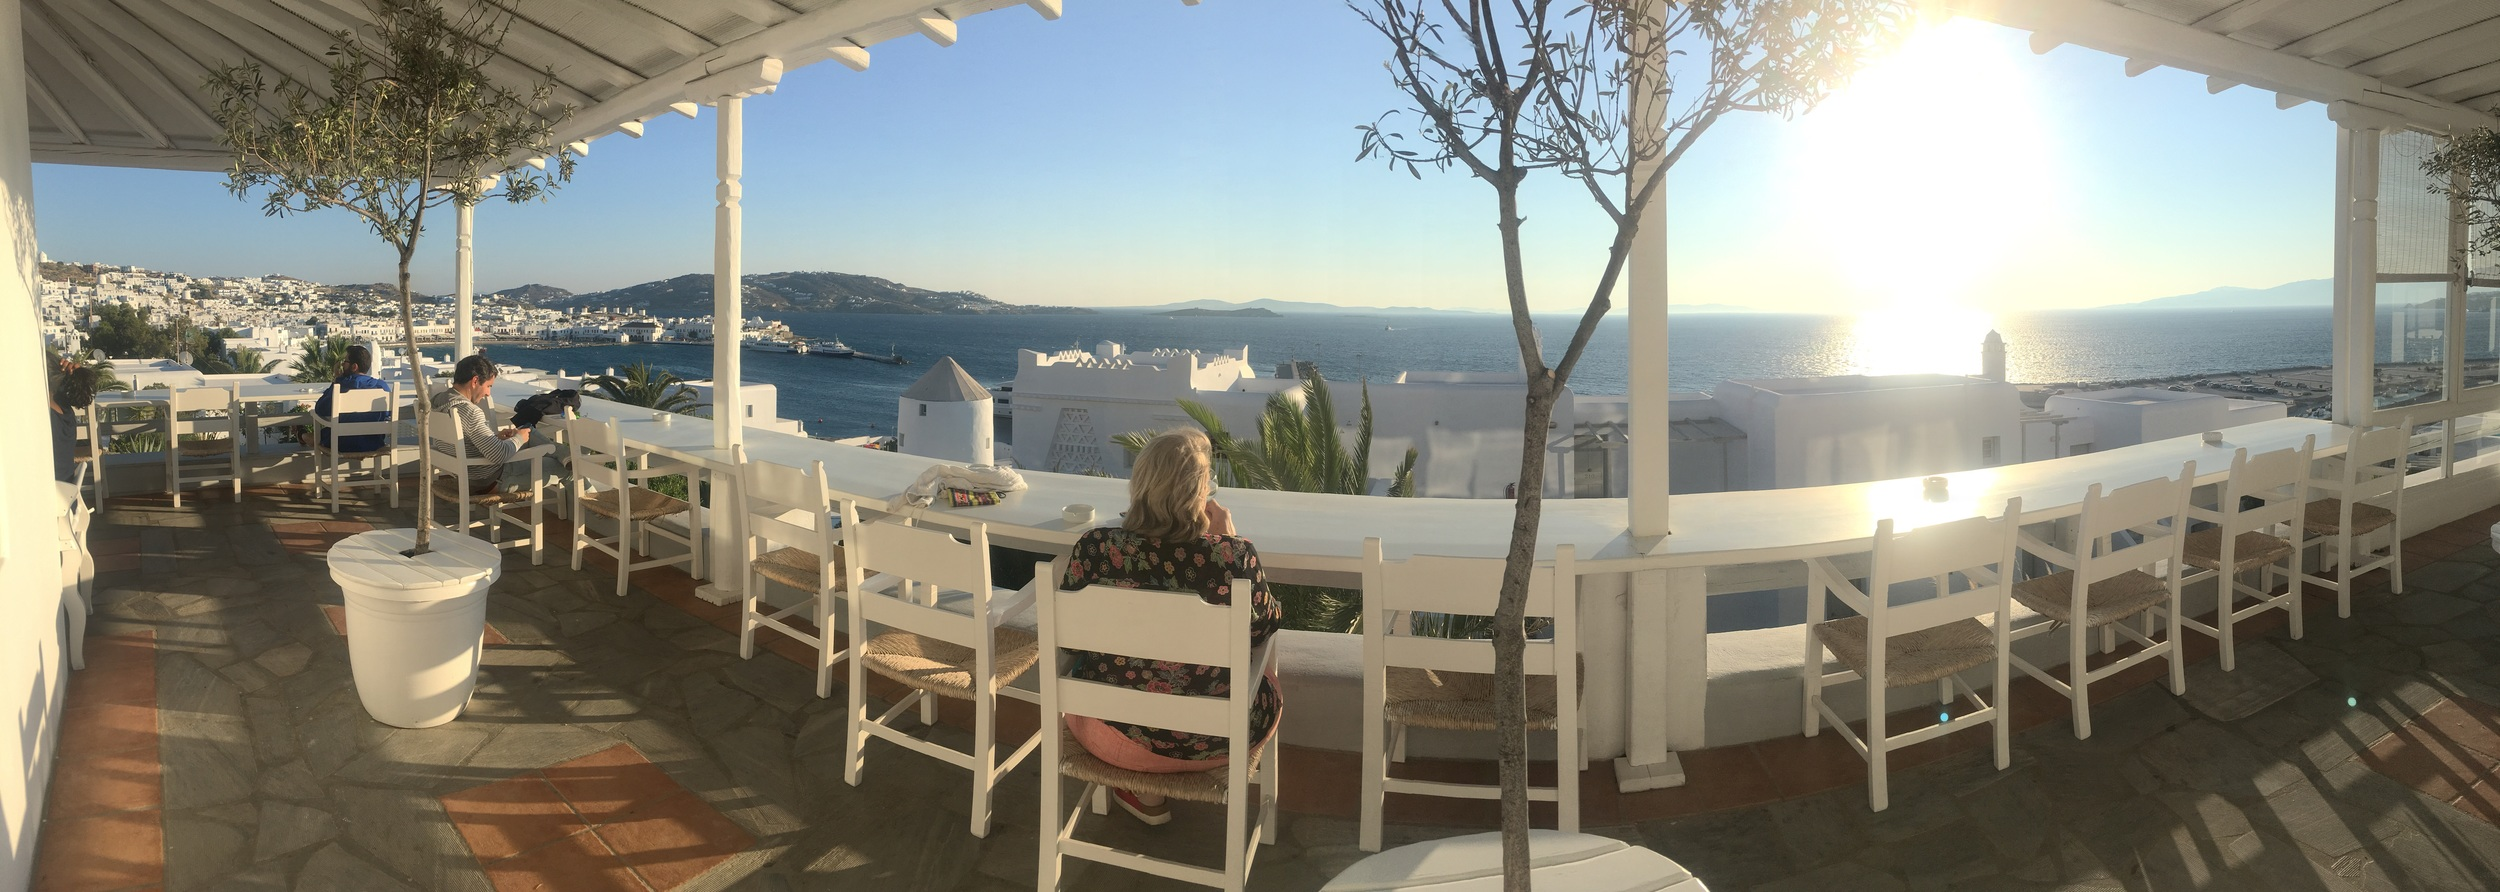 Mum enjoying the tranquility of Porto Mykonos